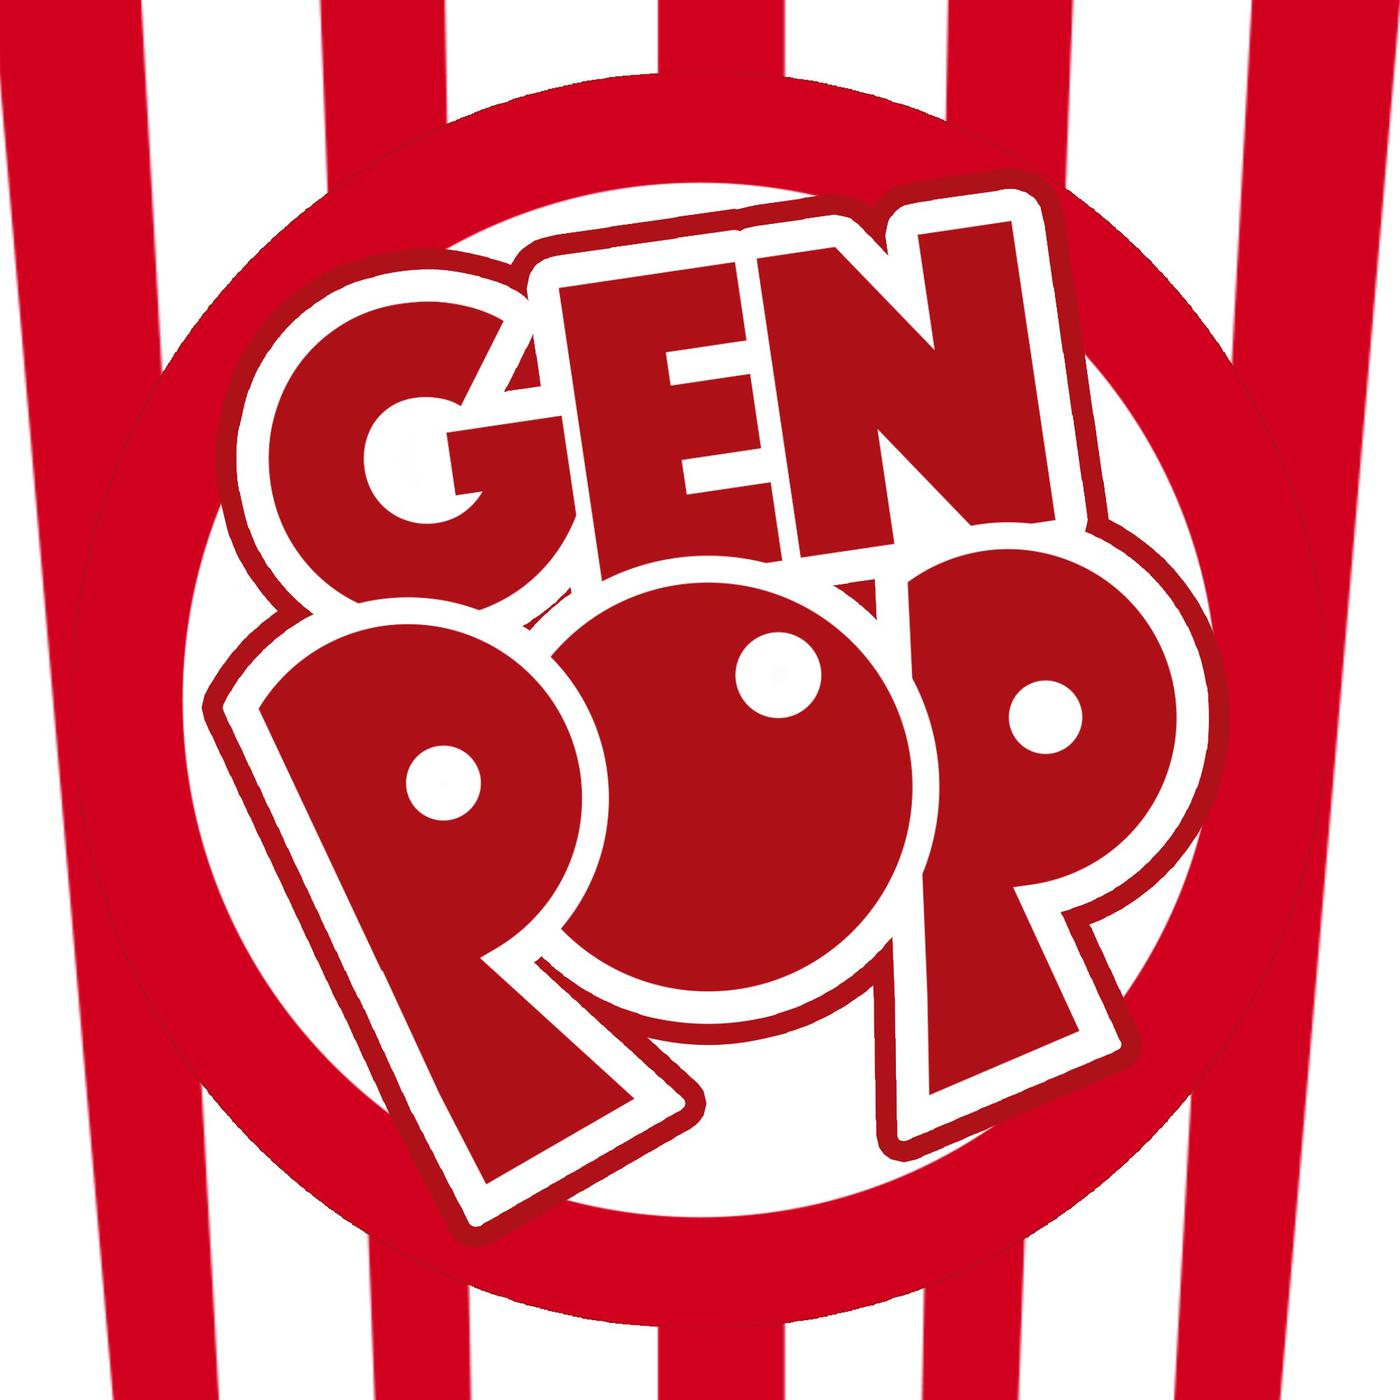 Gen Pop - A Pop Culture Podcast - David Chen and Joanna